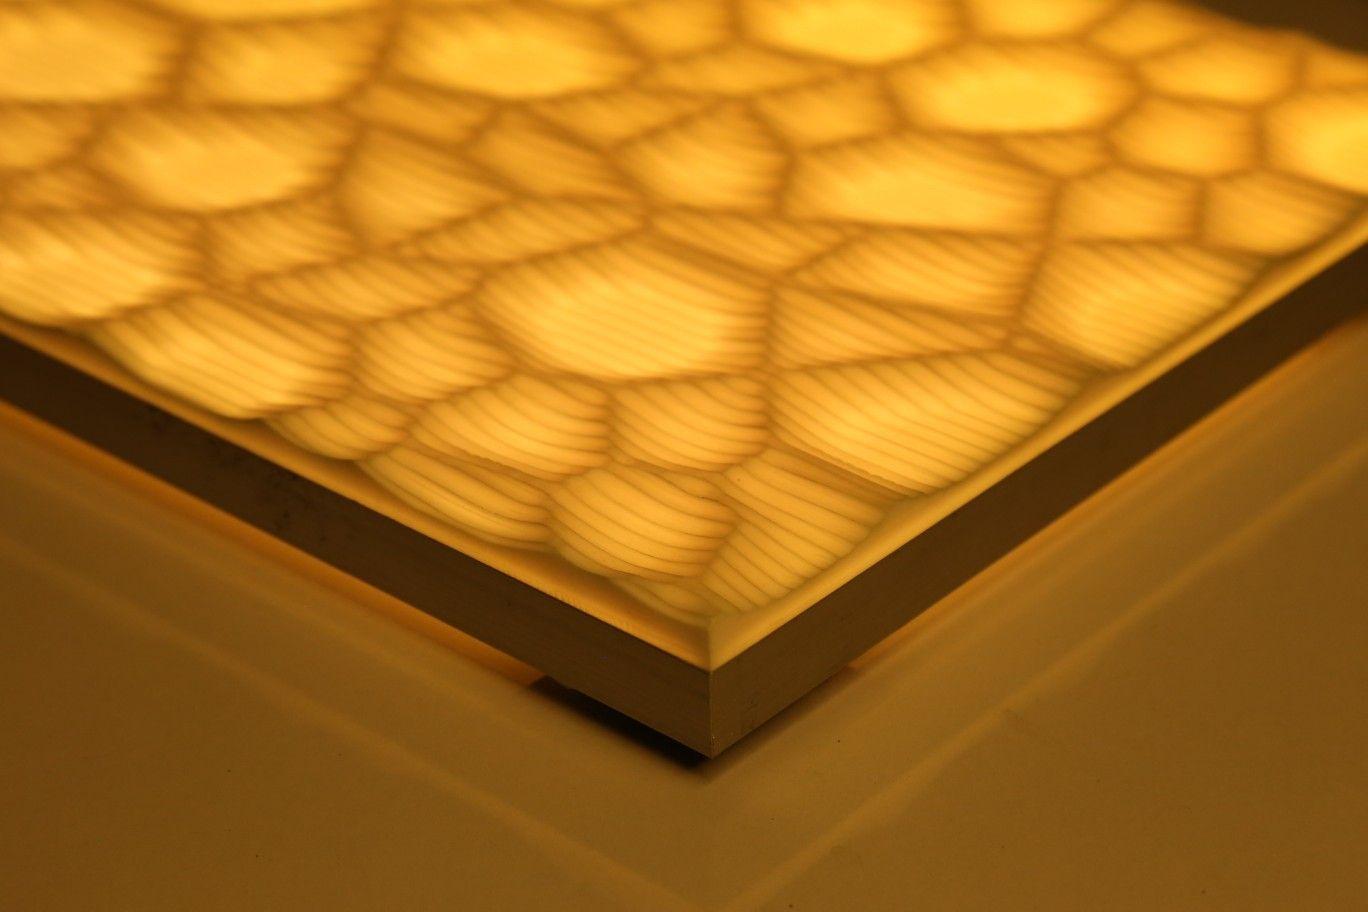 Corian light panel module | ACRYLICORE | Pinterest | Light panel